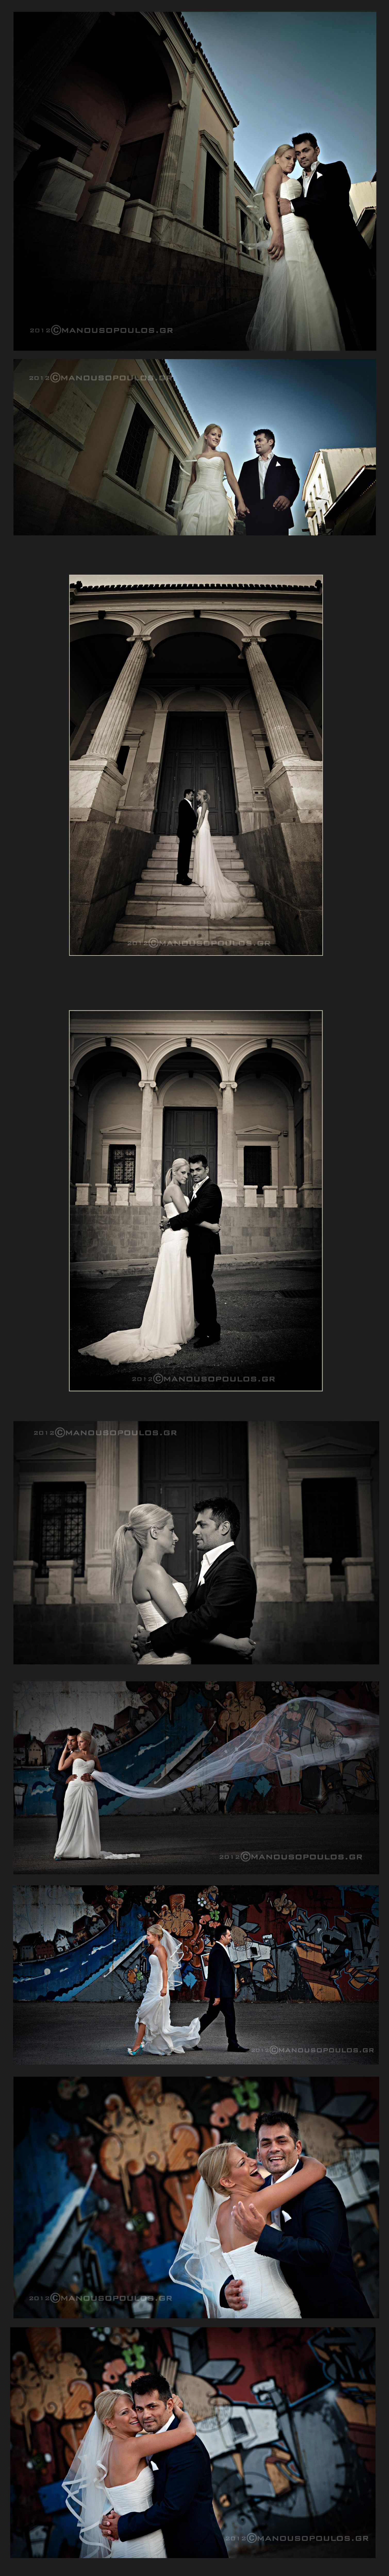 wedding photographer, φωτογραφος γαμου, wedding,